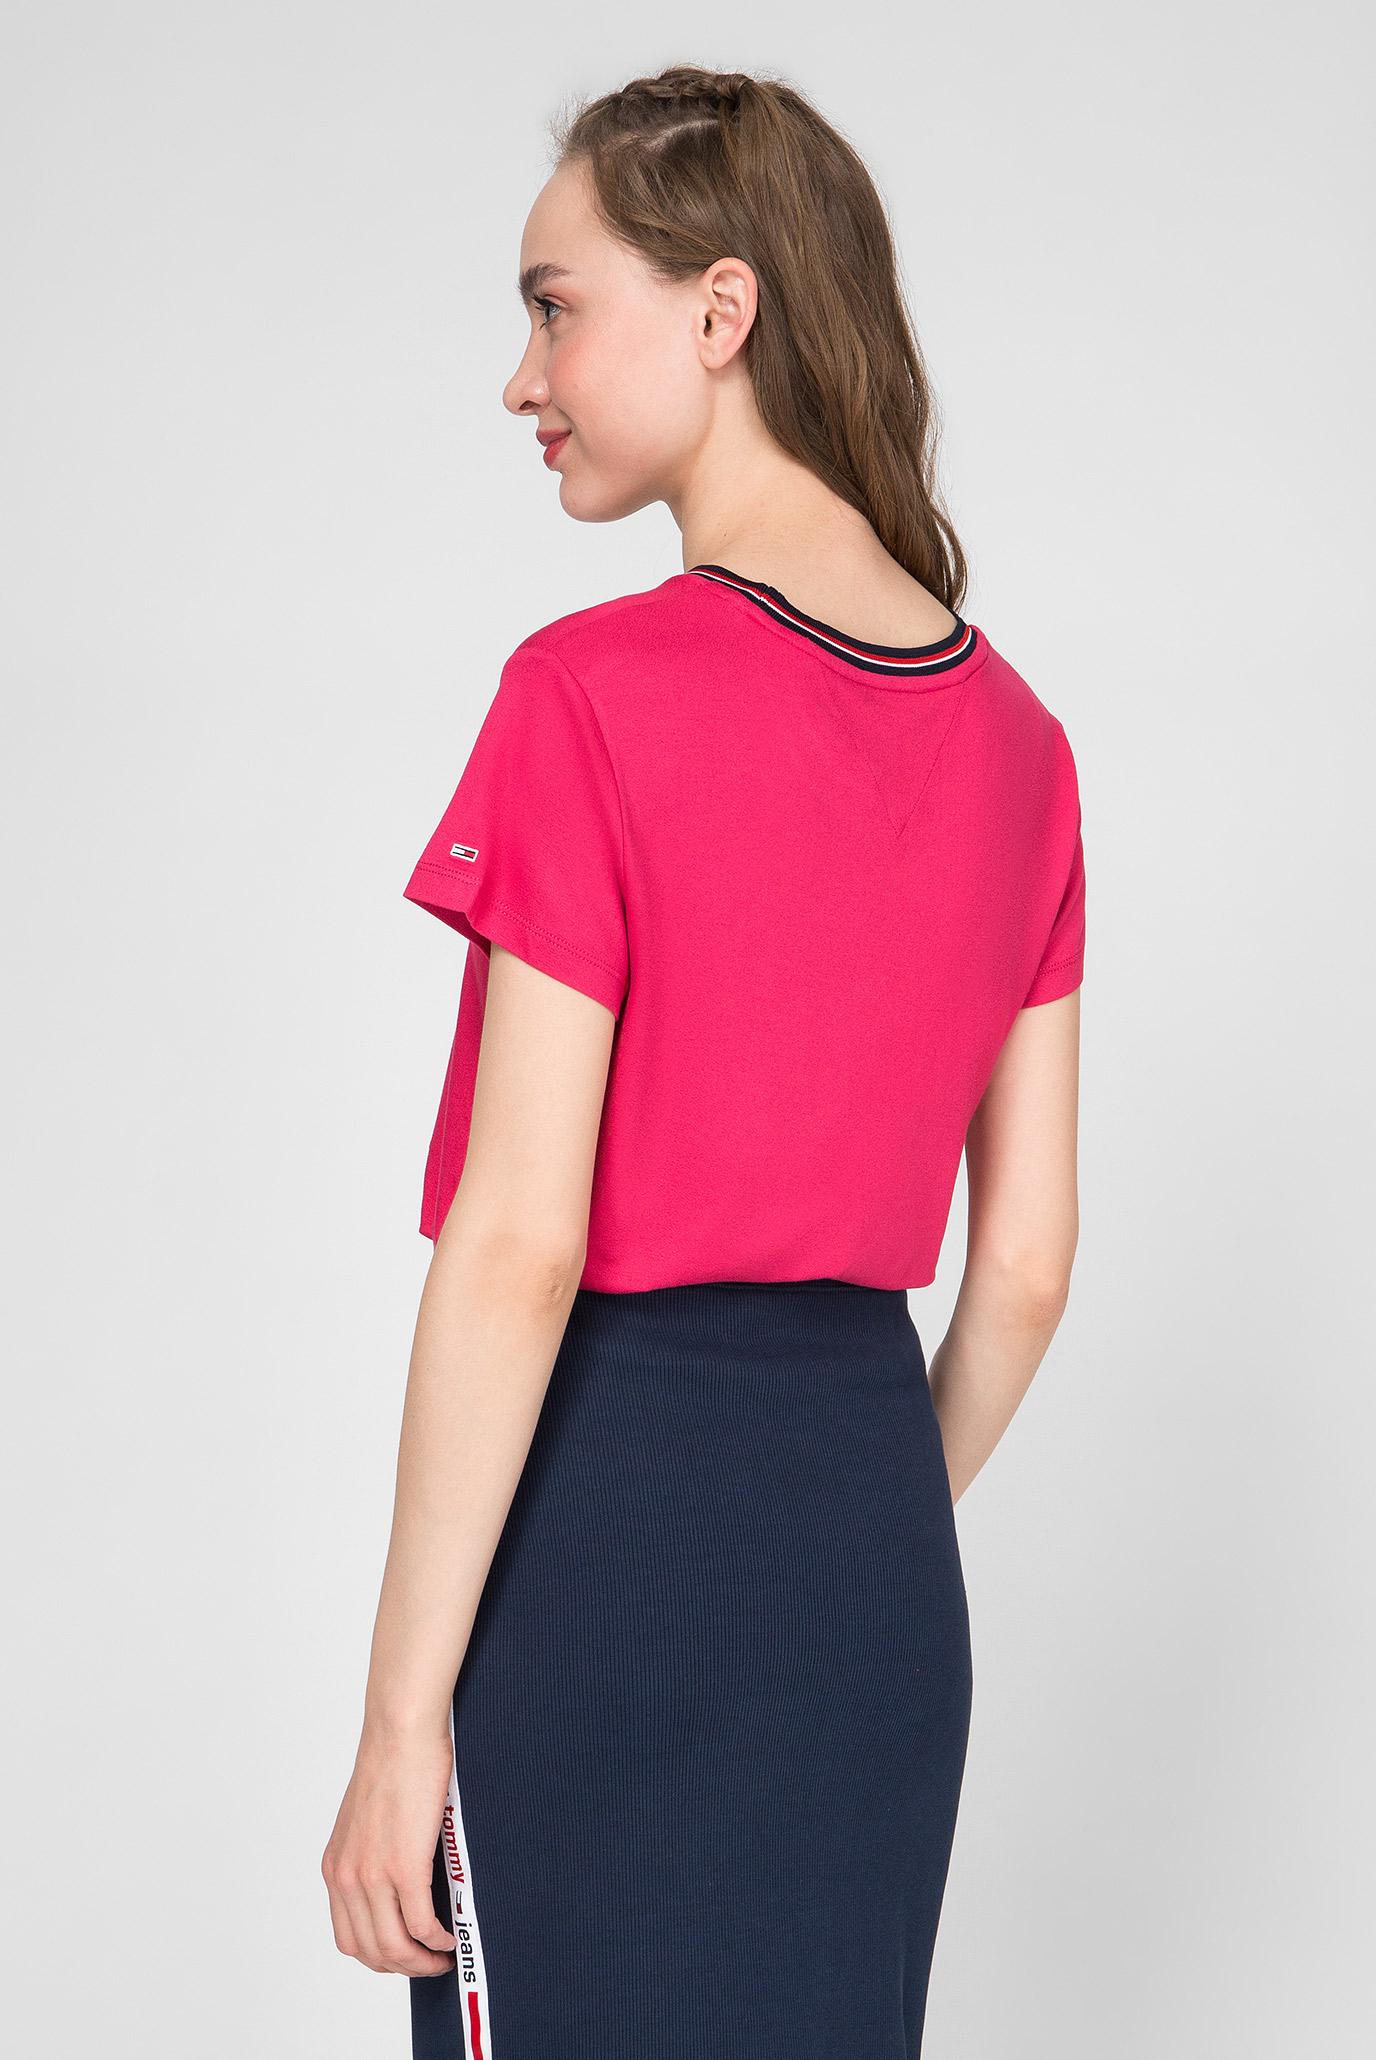 Жіноча рожева футболка TJW RIB NECK Tommy Hilfiger